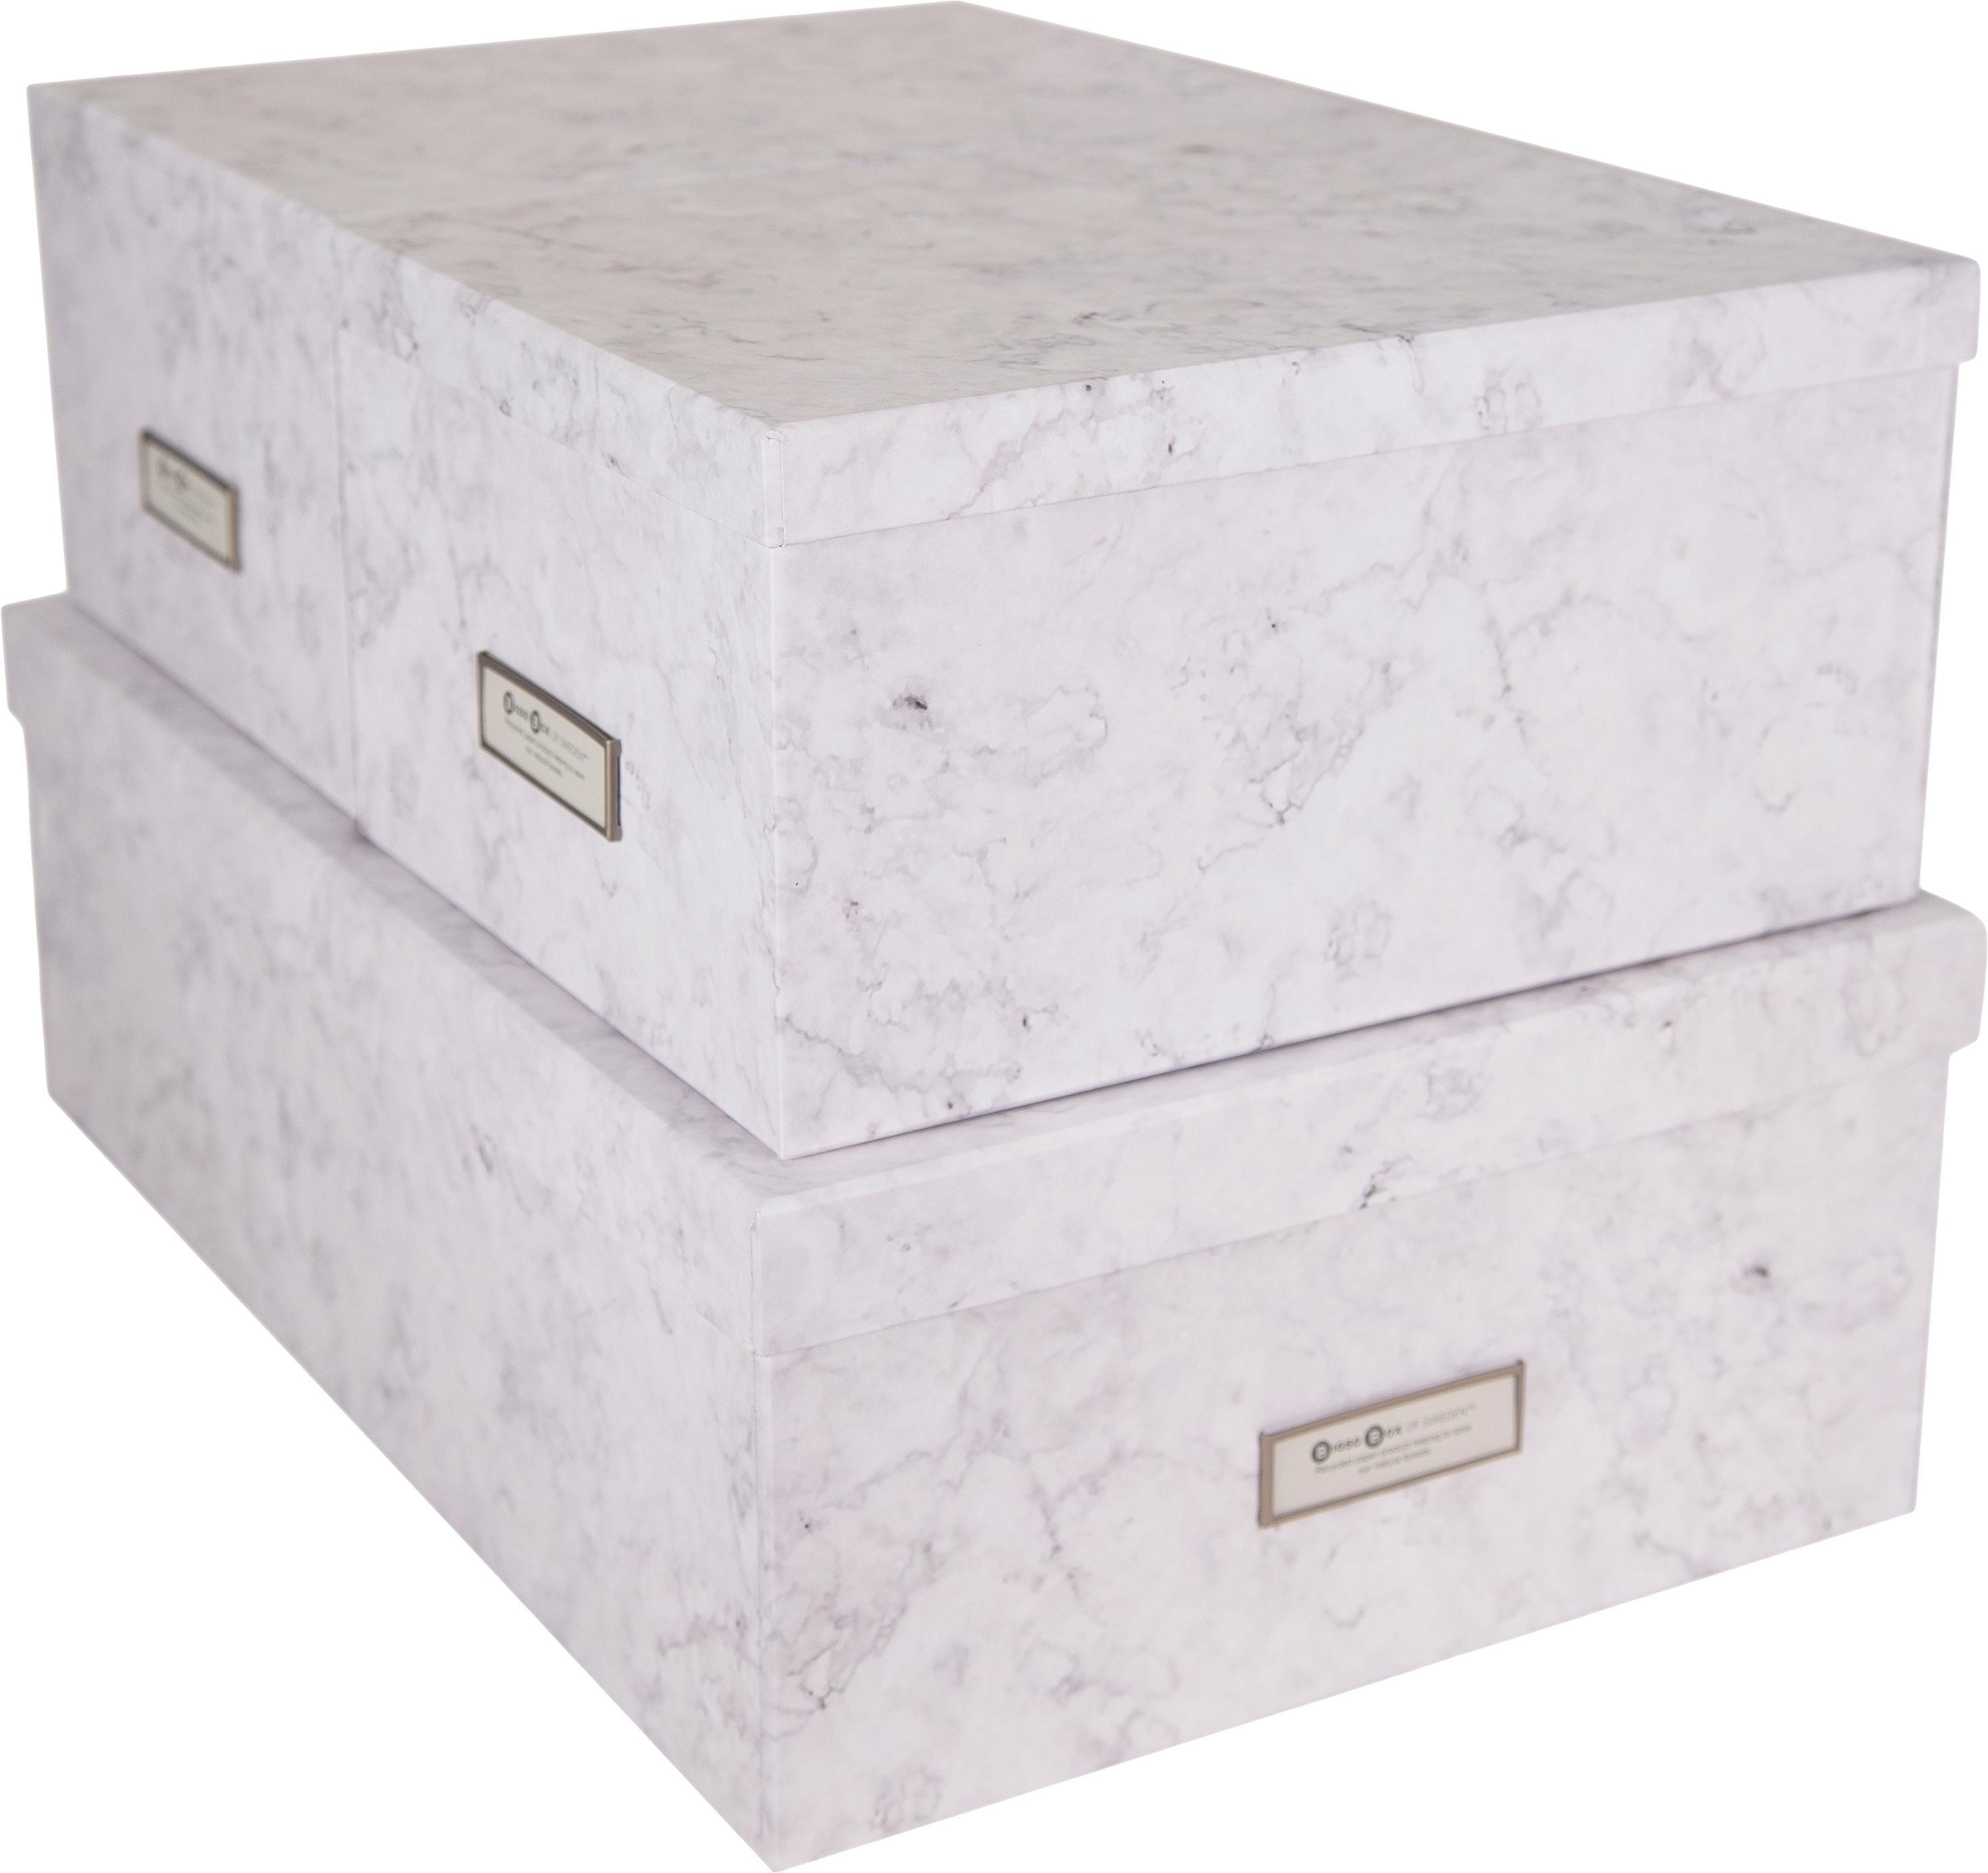 Set de cajas Inge, 3pzas., Caja: cartón laminado, Blanco veteado, Set de diferentes tamaños